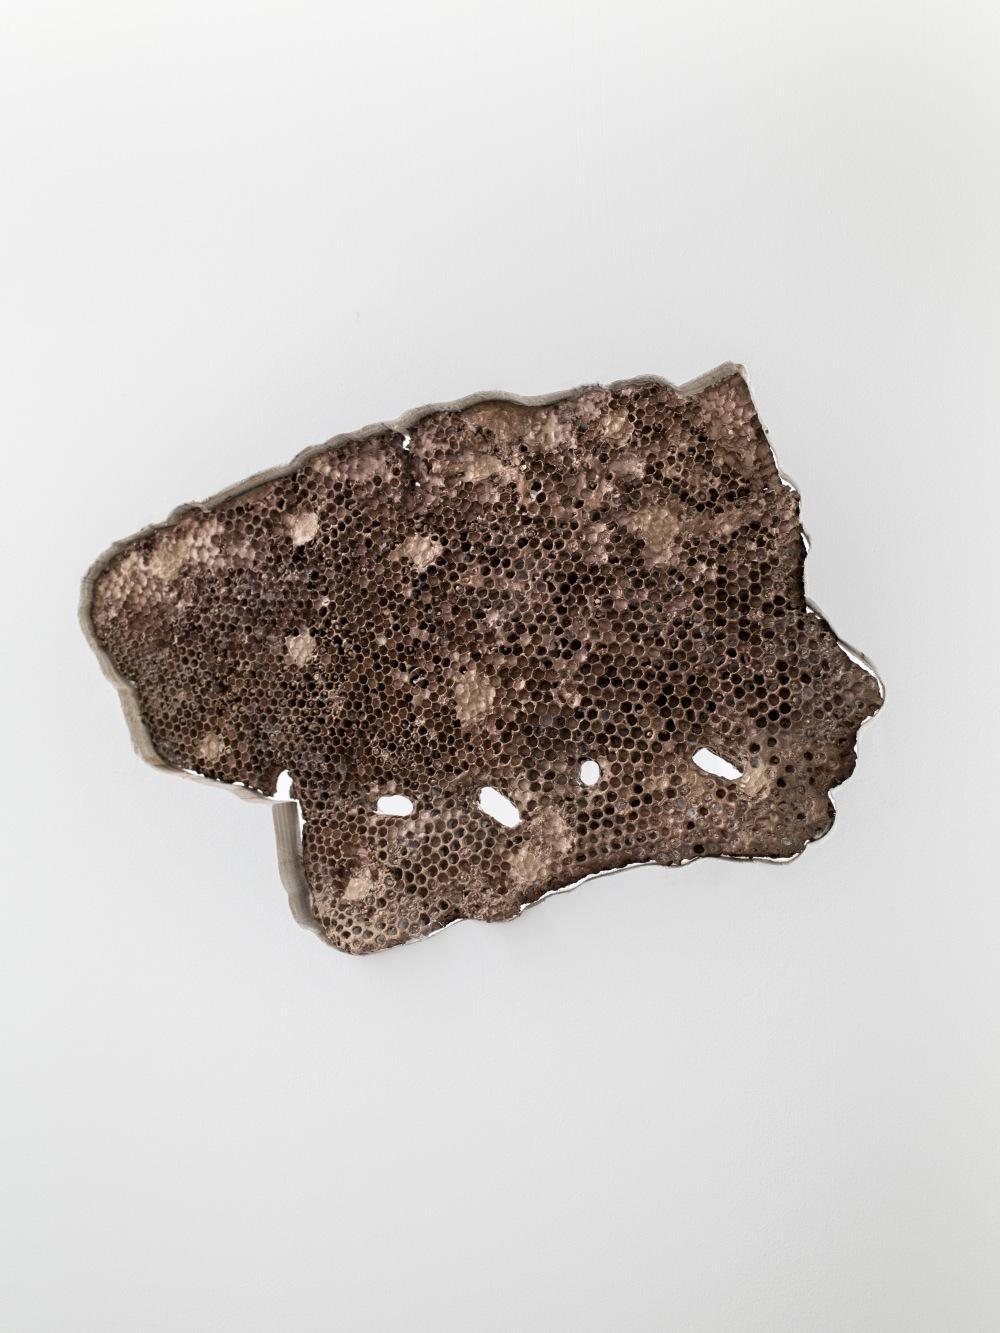 Simul et singulis, Lulu Nuti, bronze, 37x25x3 cm, 2019 © GALERIE CHLOE SALGADO